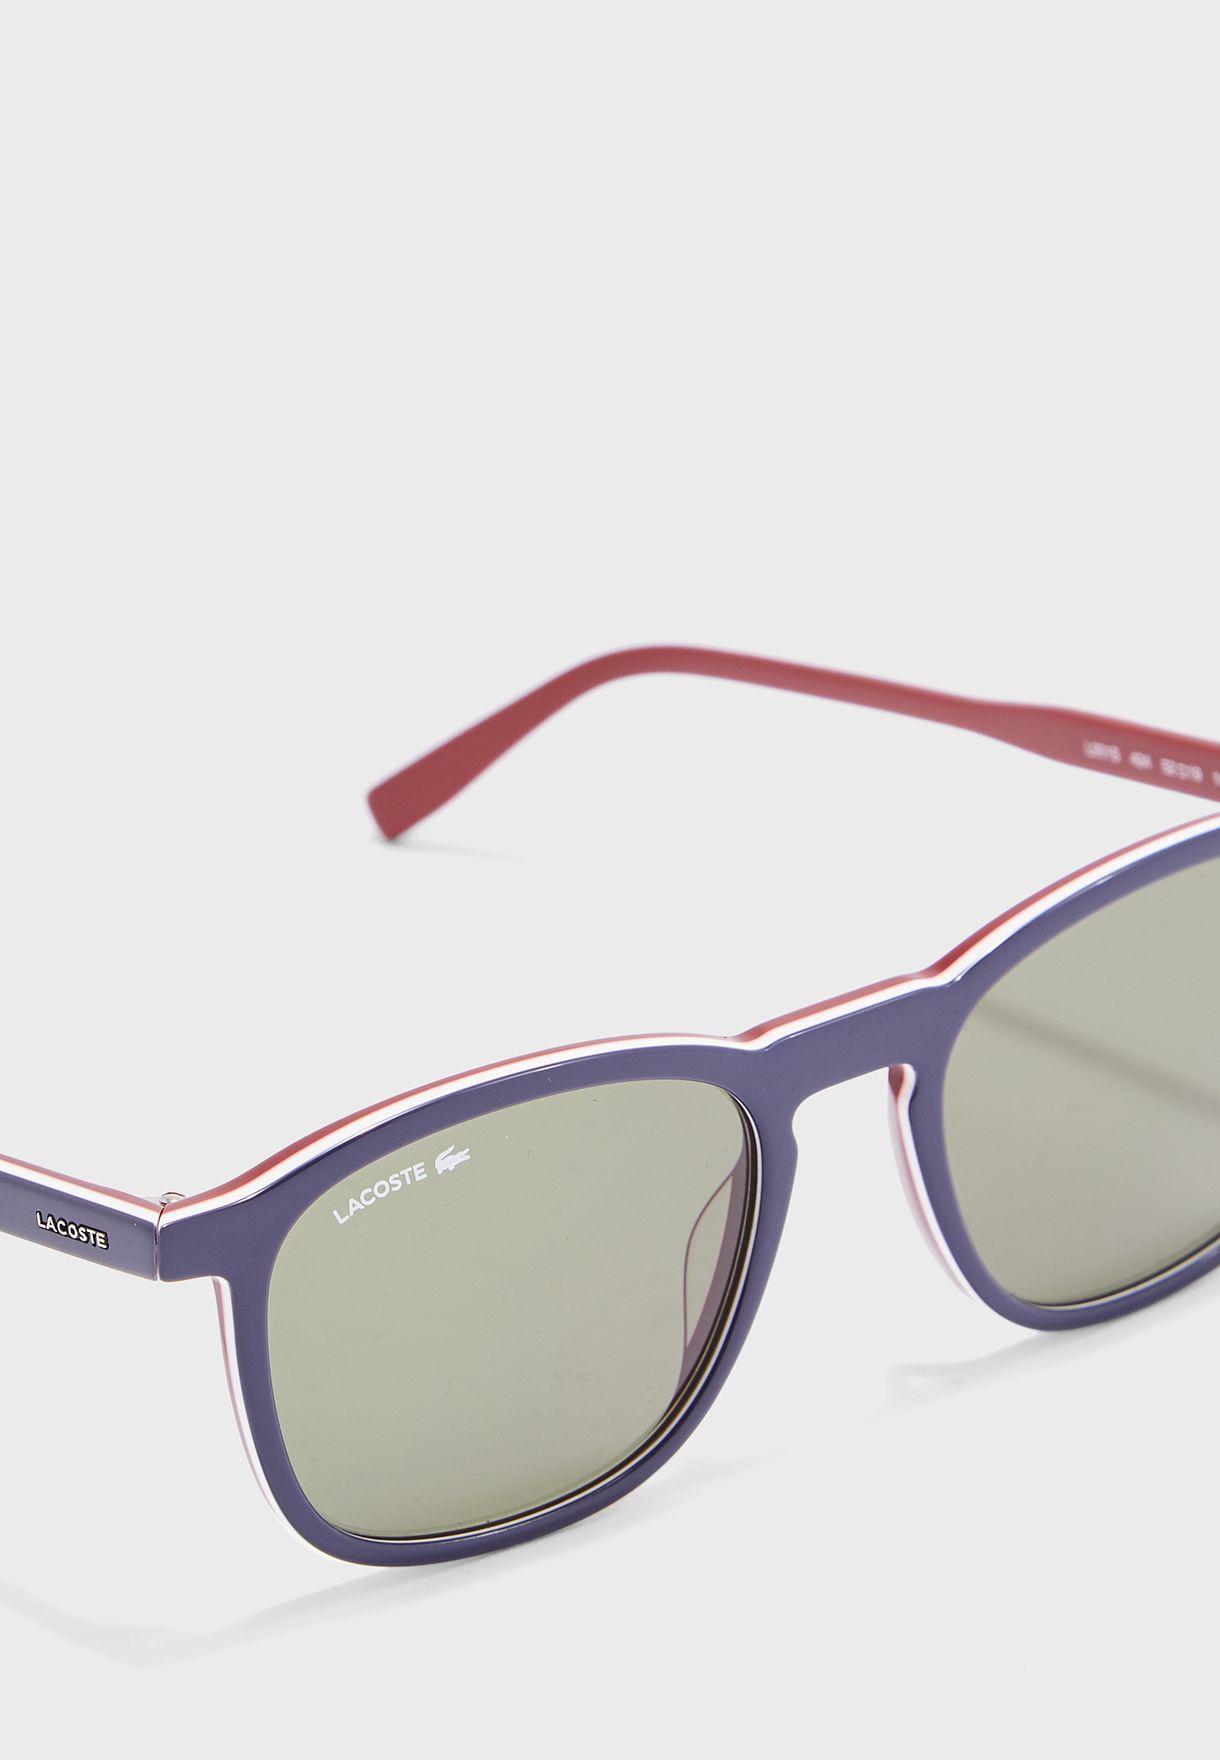 L901S Modified Rectangle Sunglasses